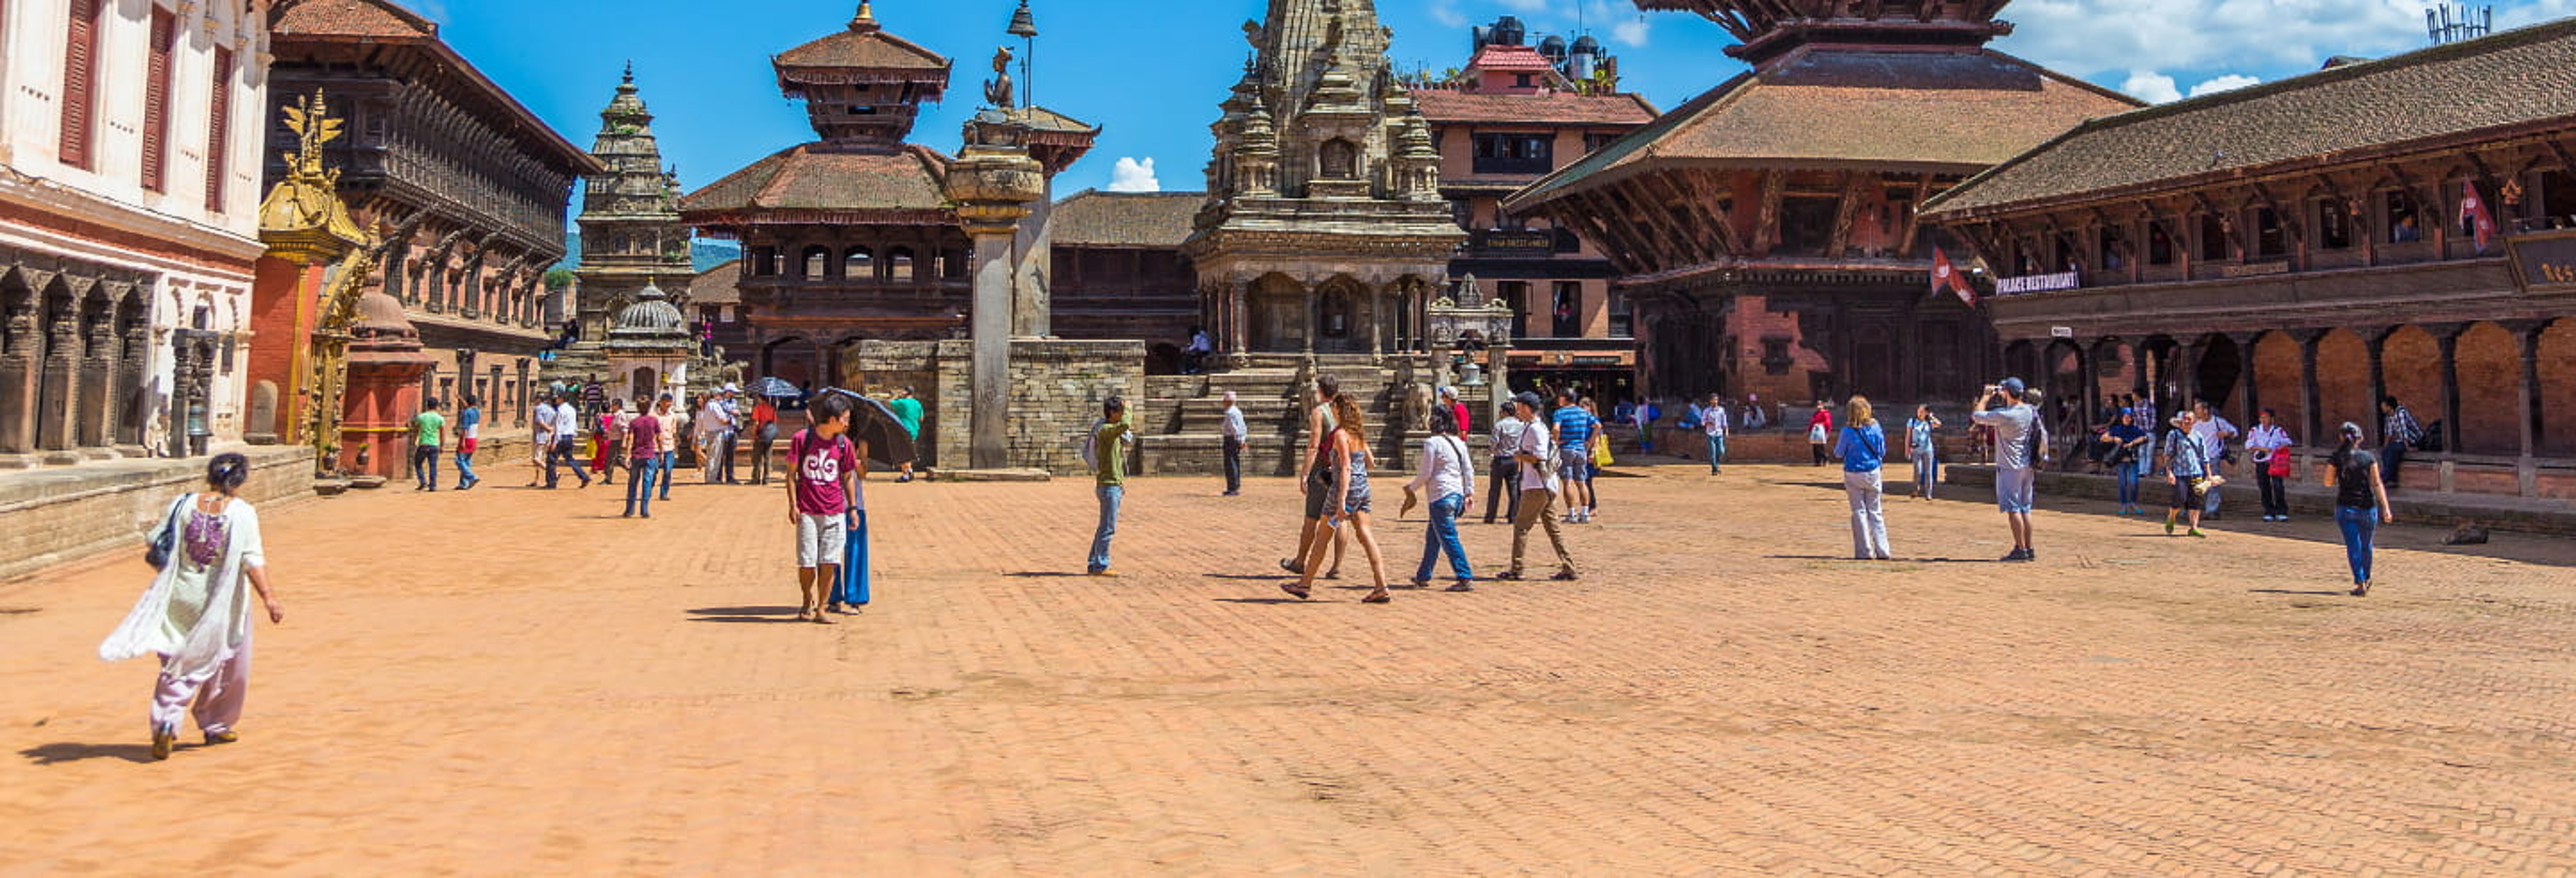 Excursão privada a Bhaktapur